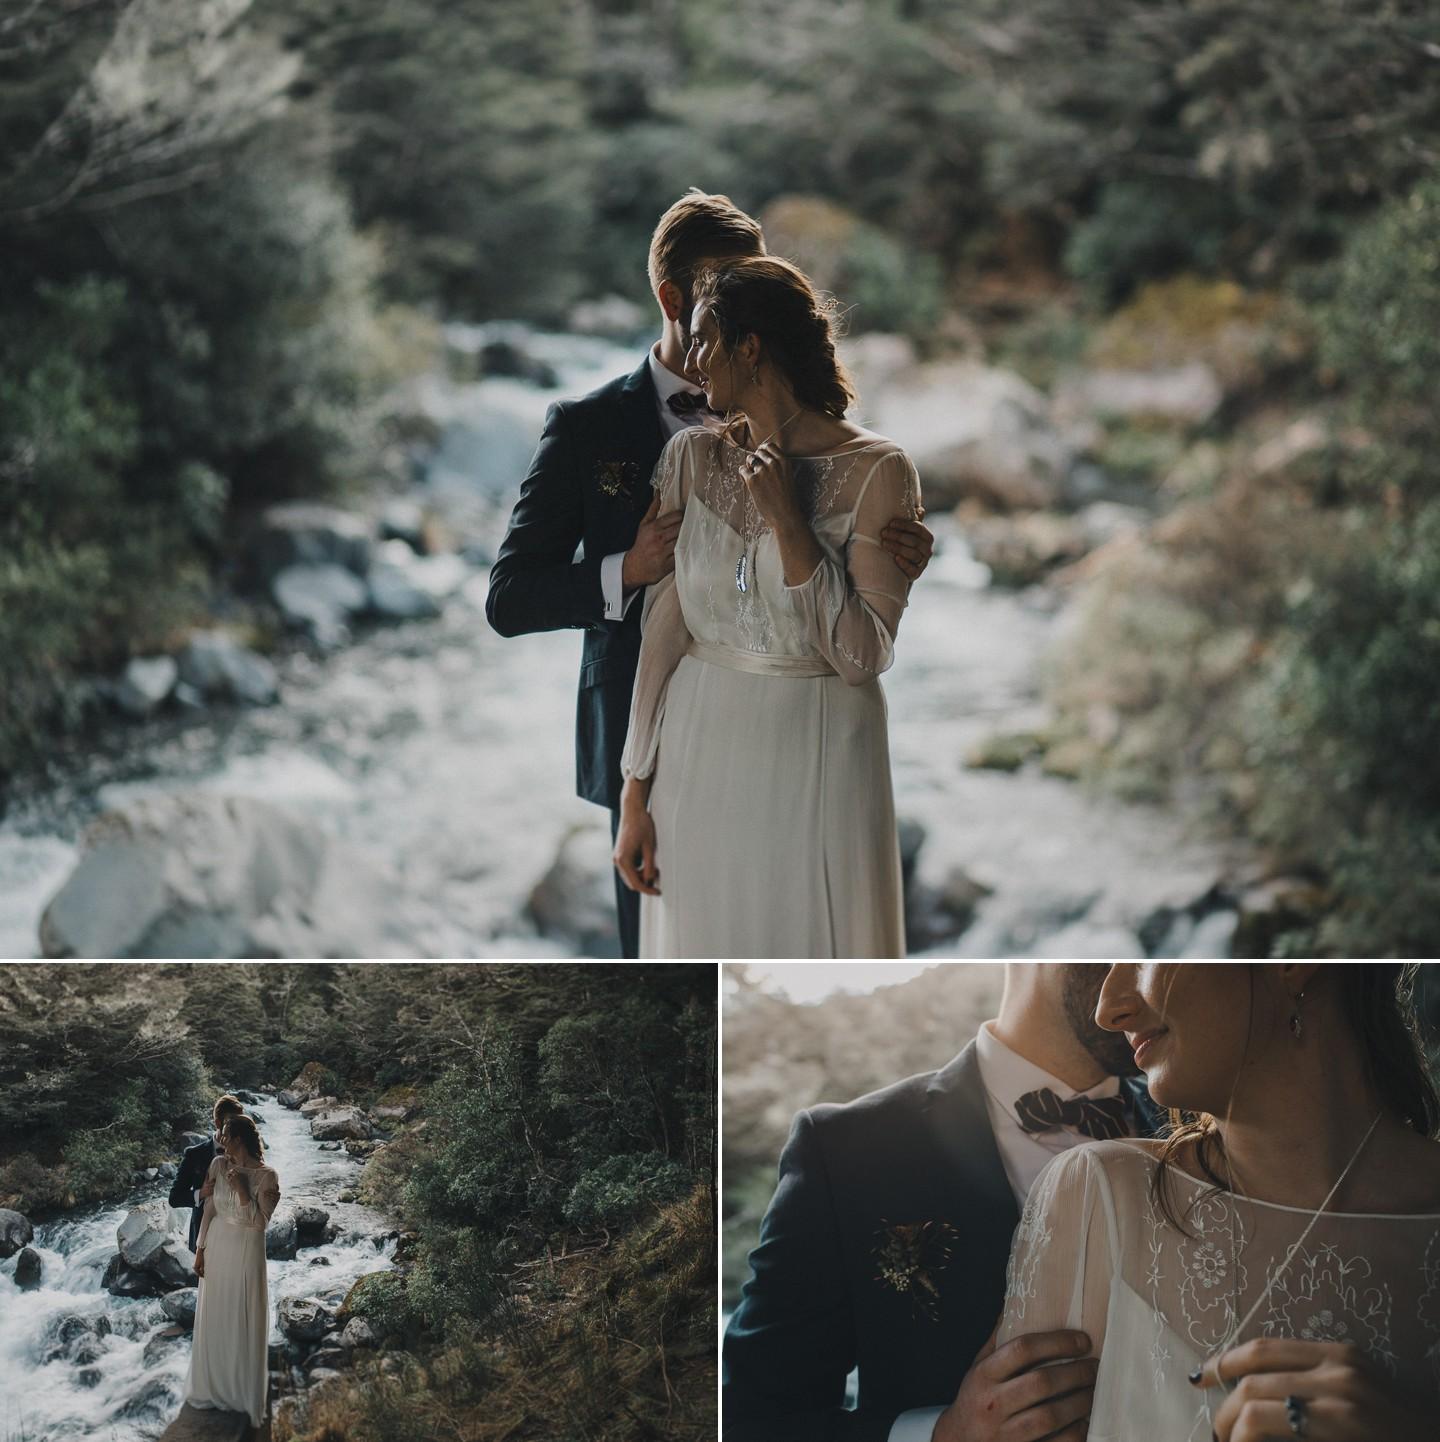 Saja Bridal wedding dress